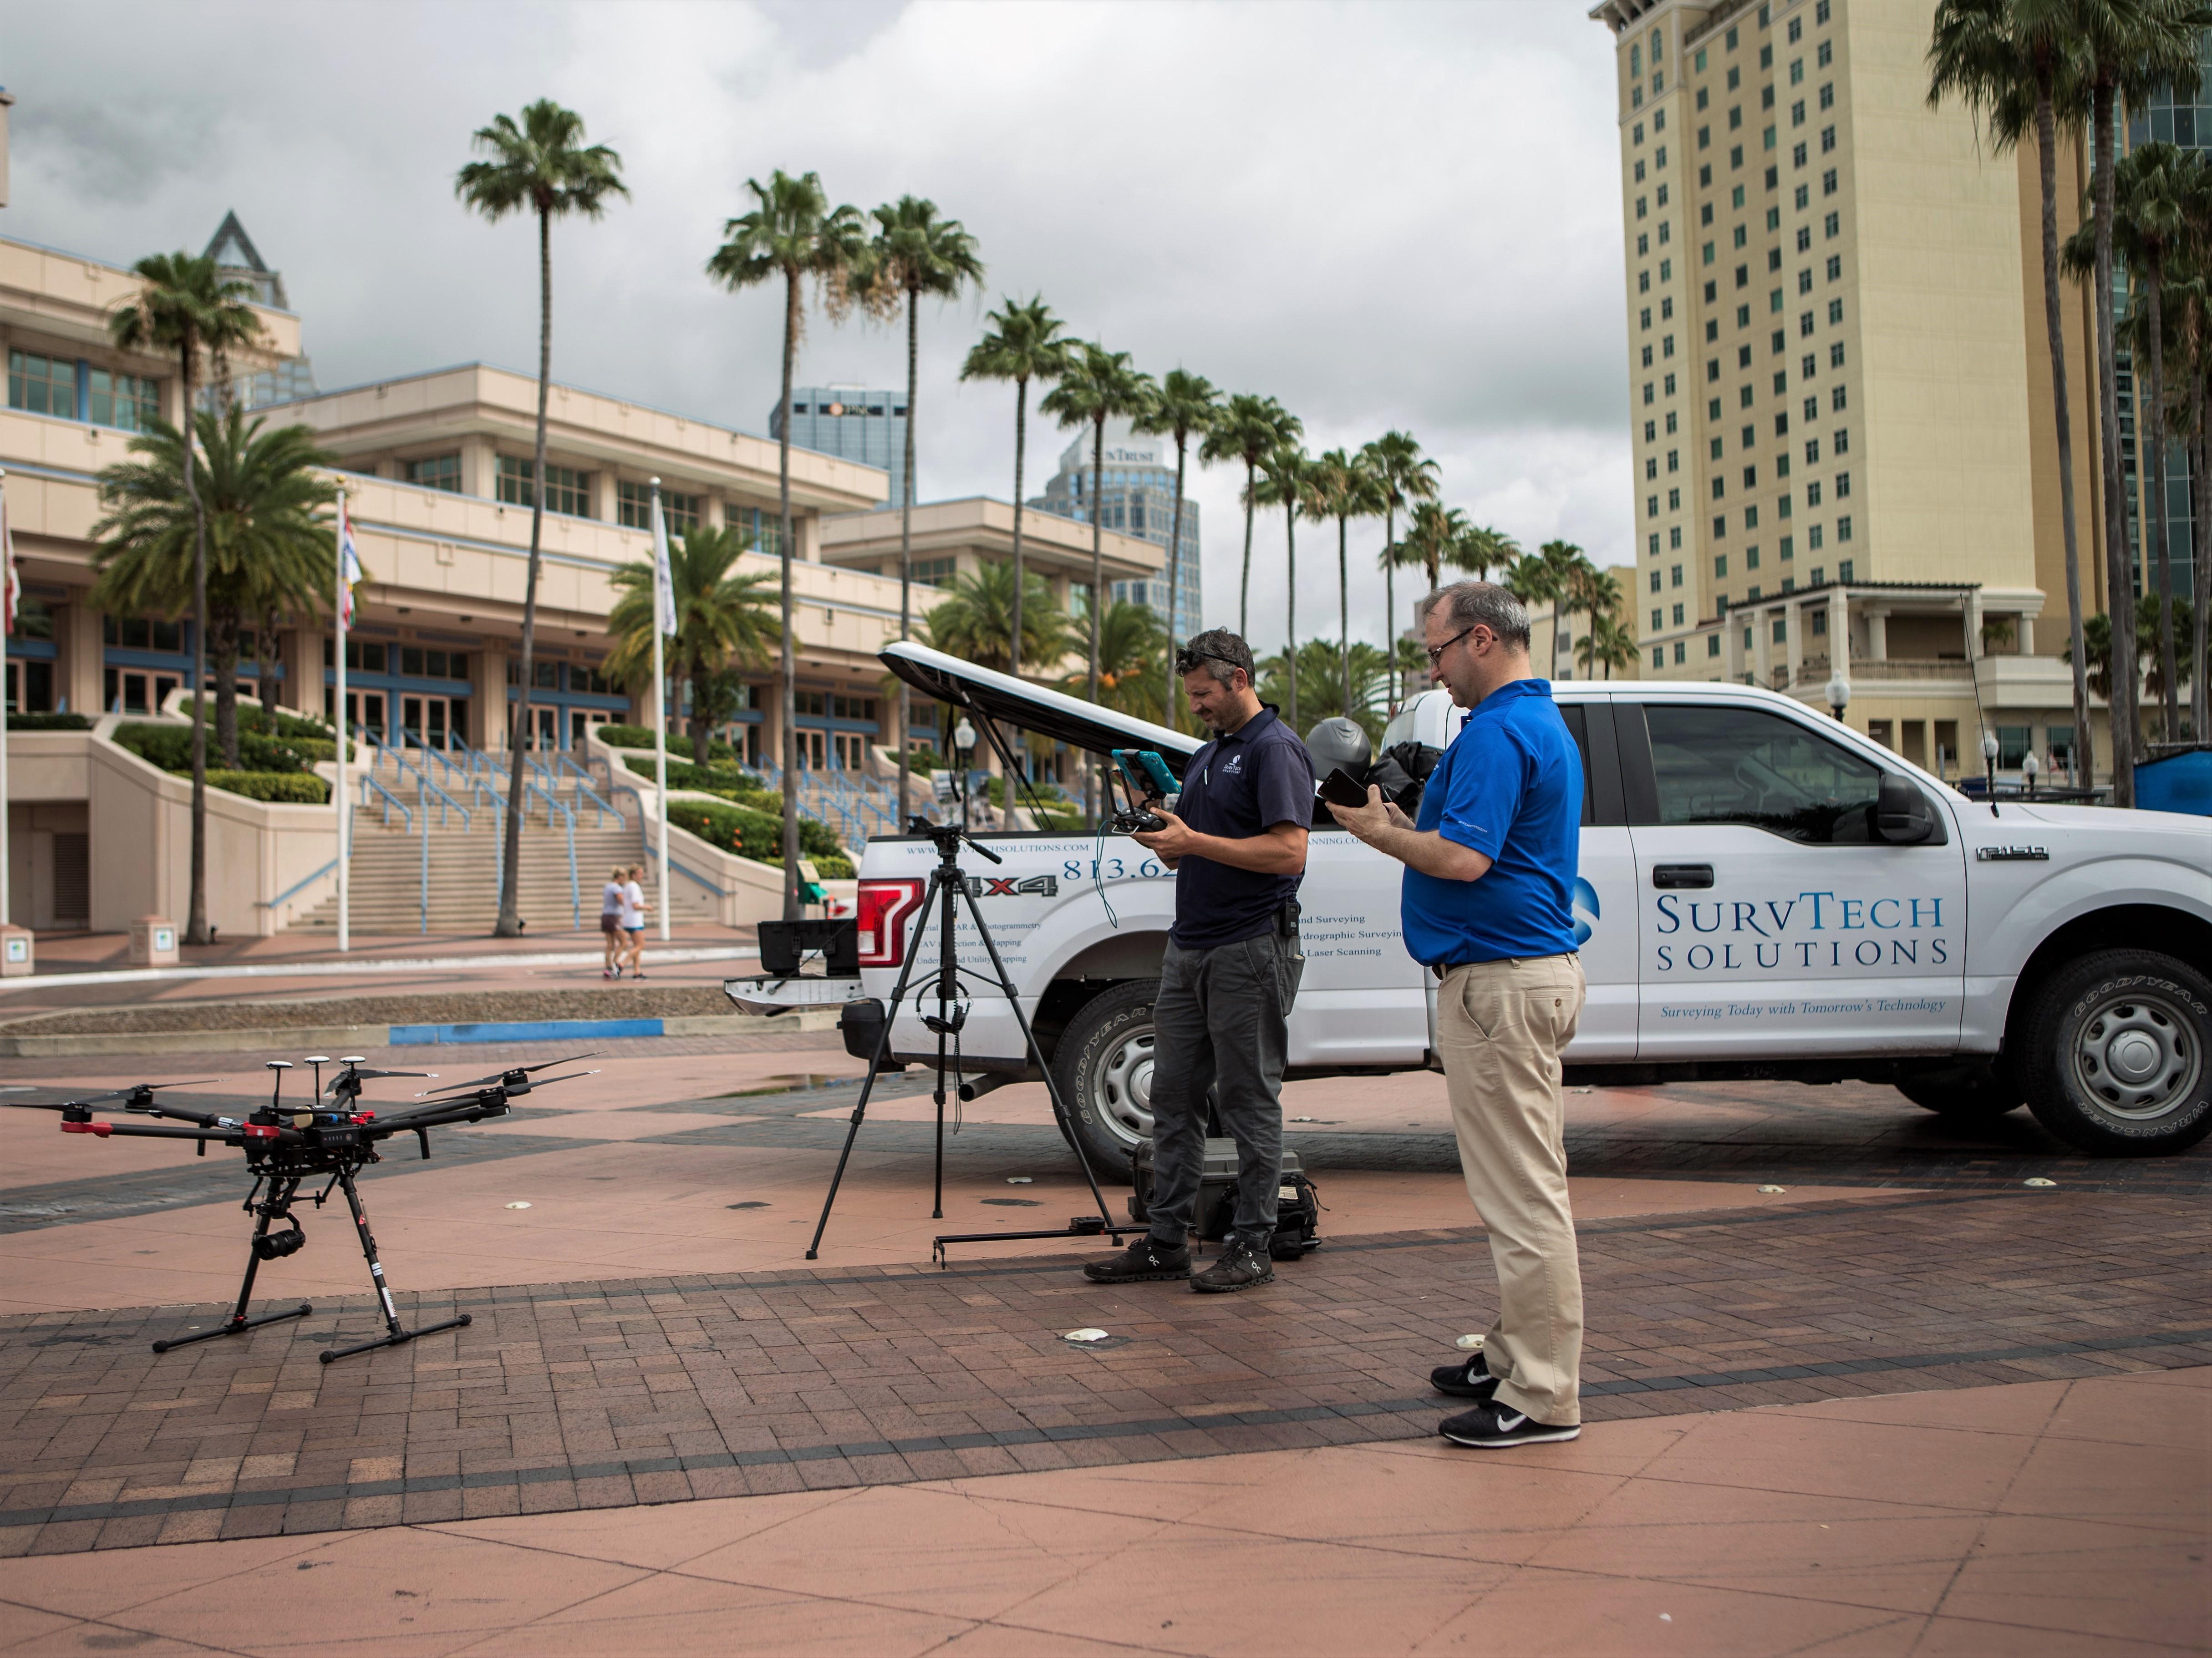 UAV Surveyors using Drones